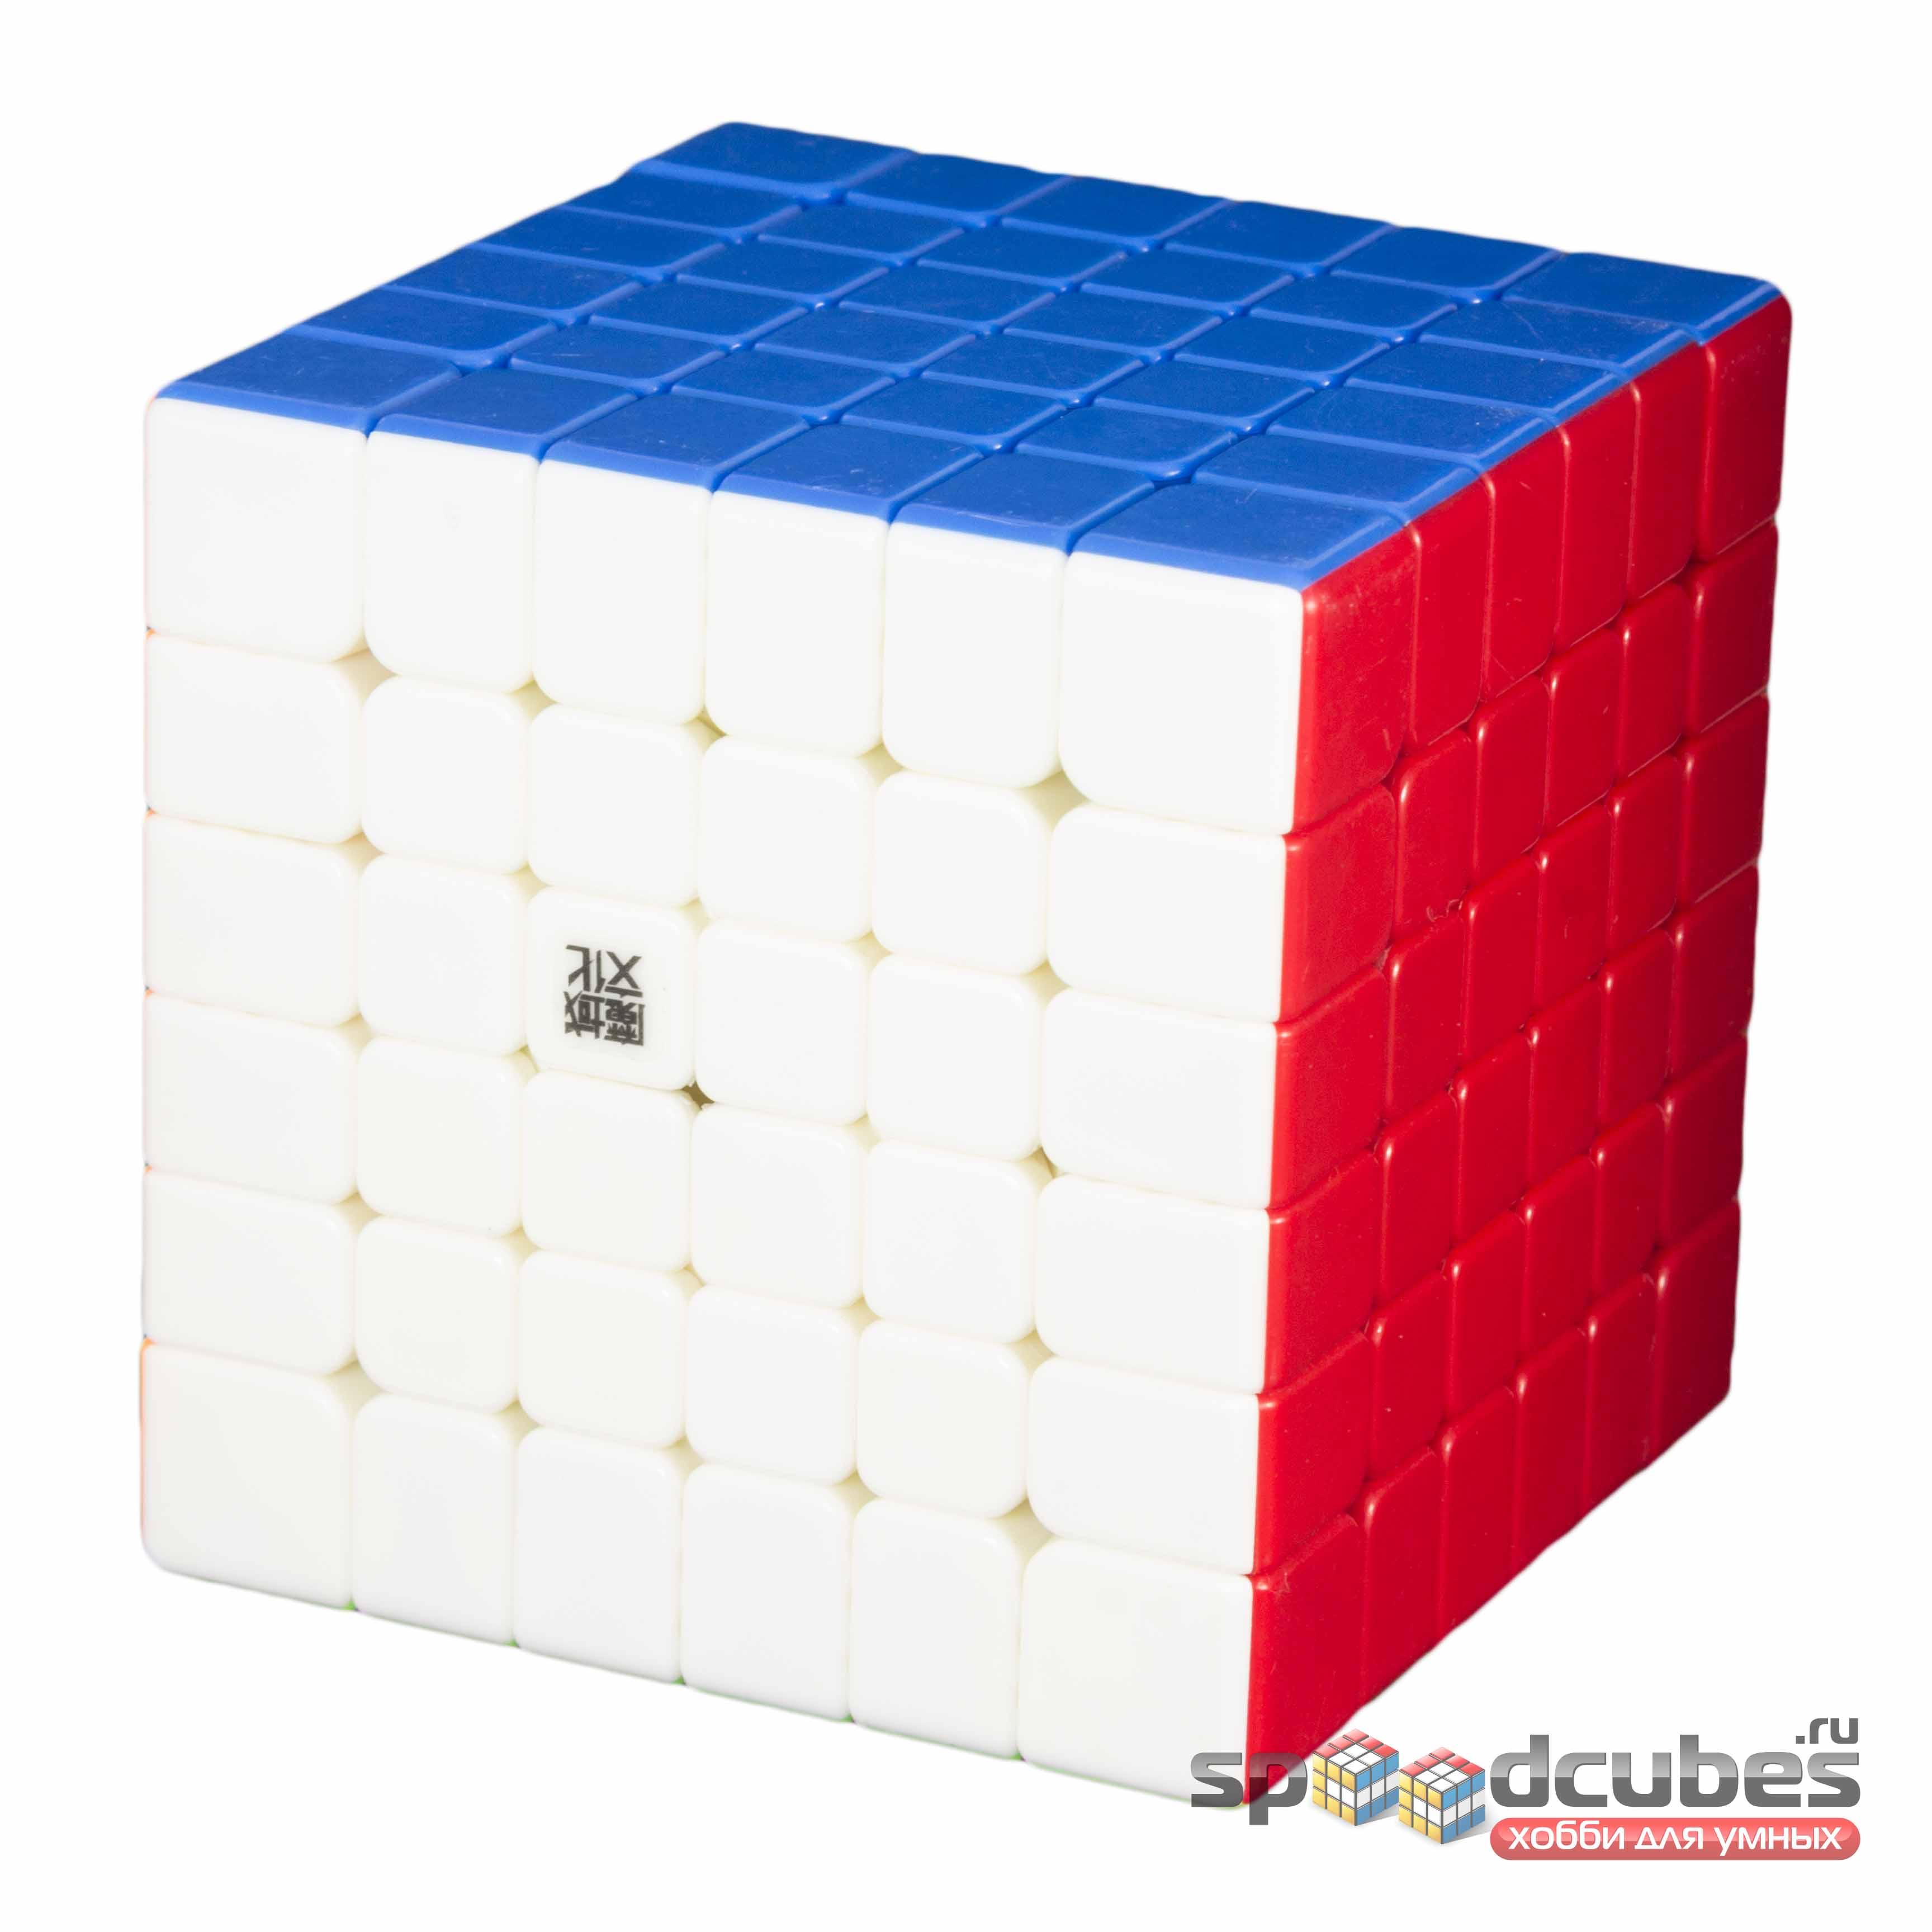 MoYu 6x6x6 Aoshi GTS M Color 3